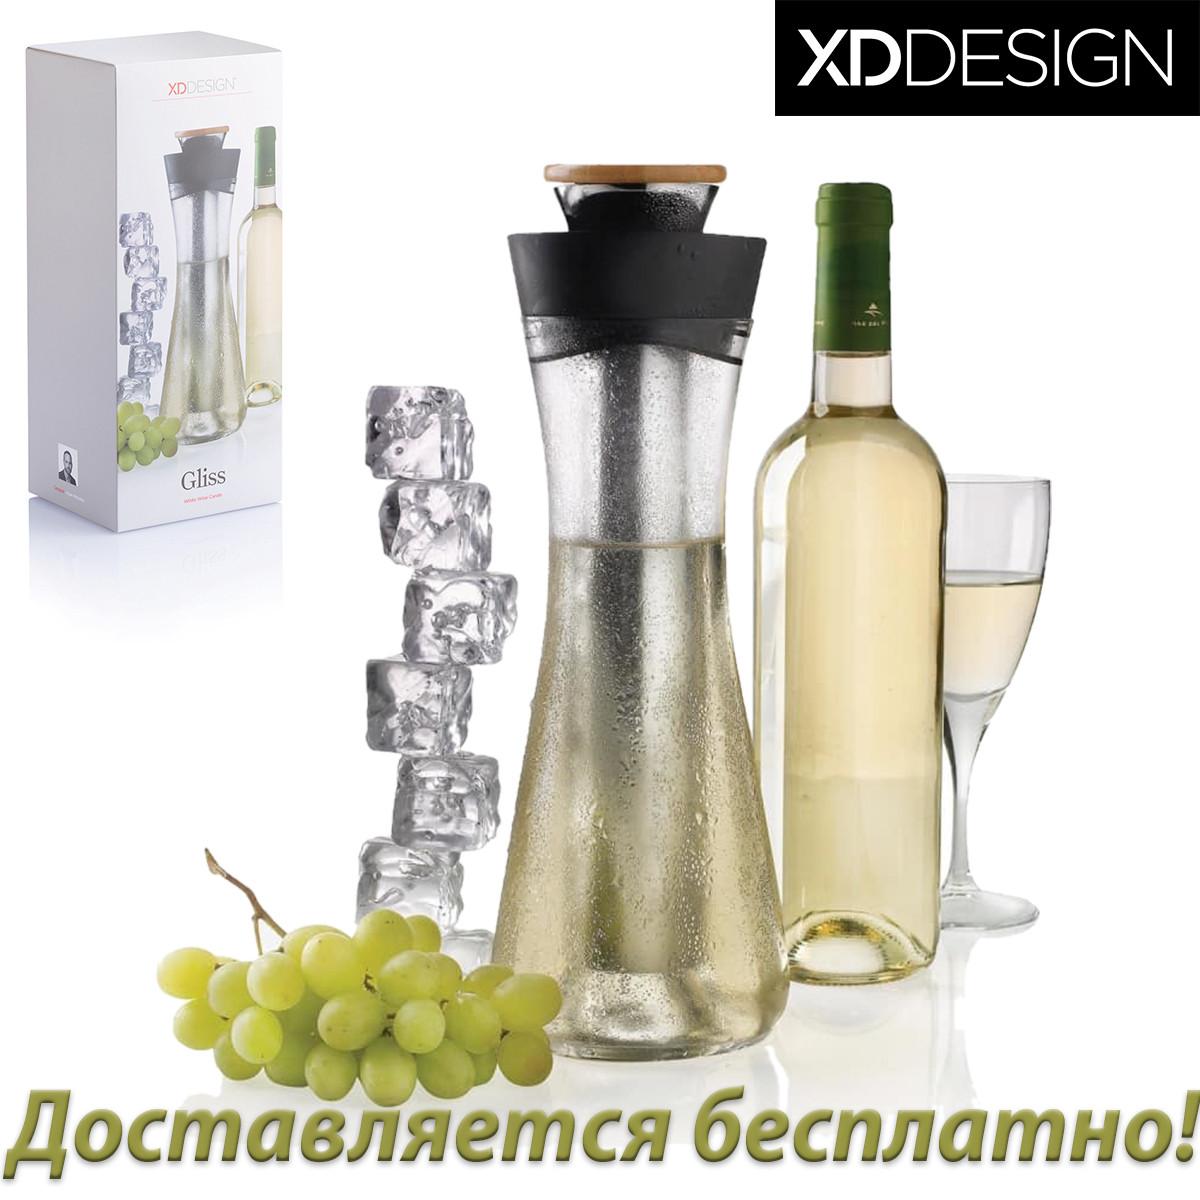 Графин для белого вина XD Design Gliss с контейнером для льда 750 мл. (P264.021)